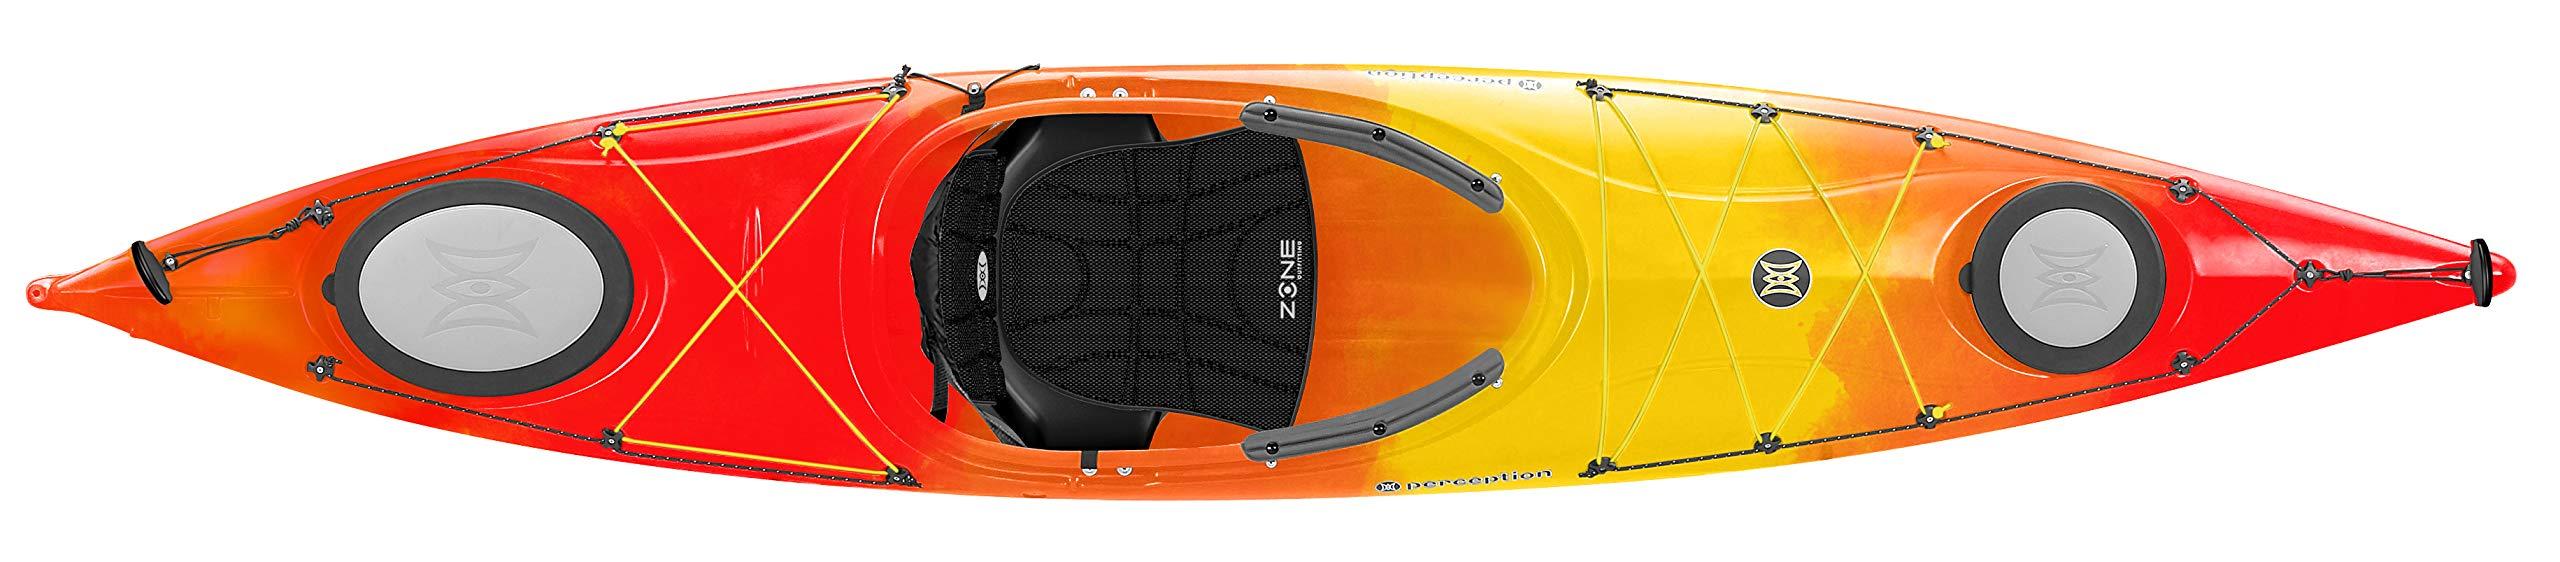 Perception Kayak Carolina Sit Inside for Recreation by Perception Kayaks